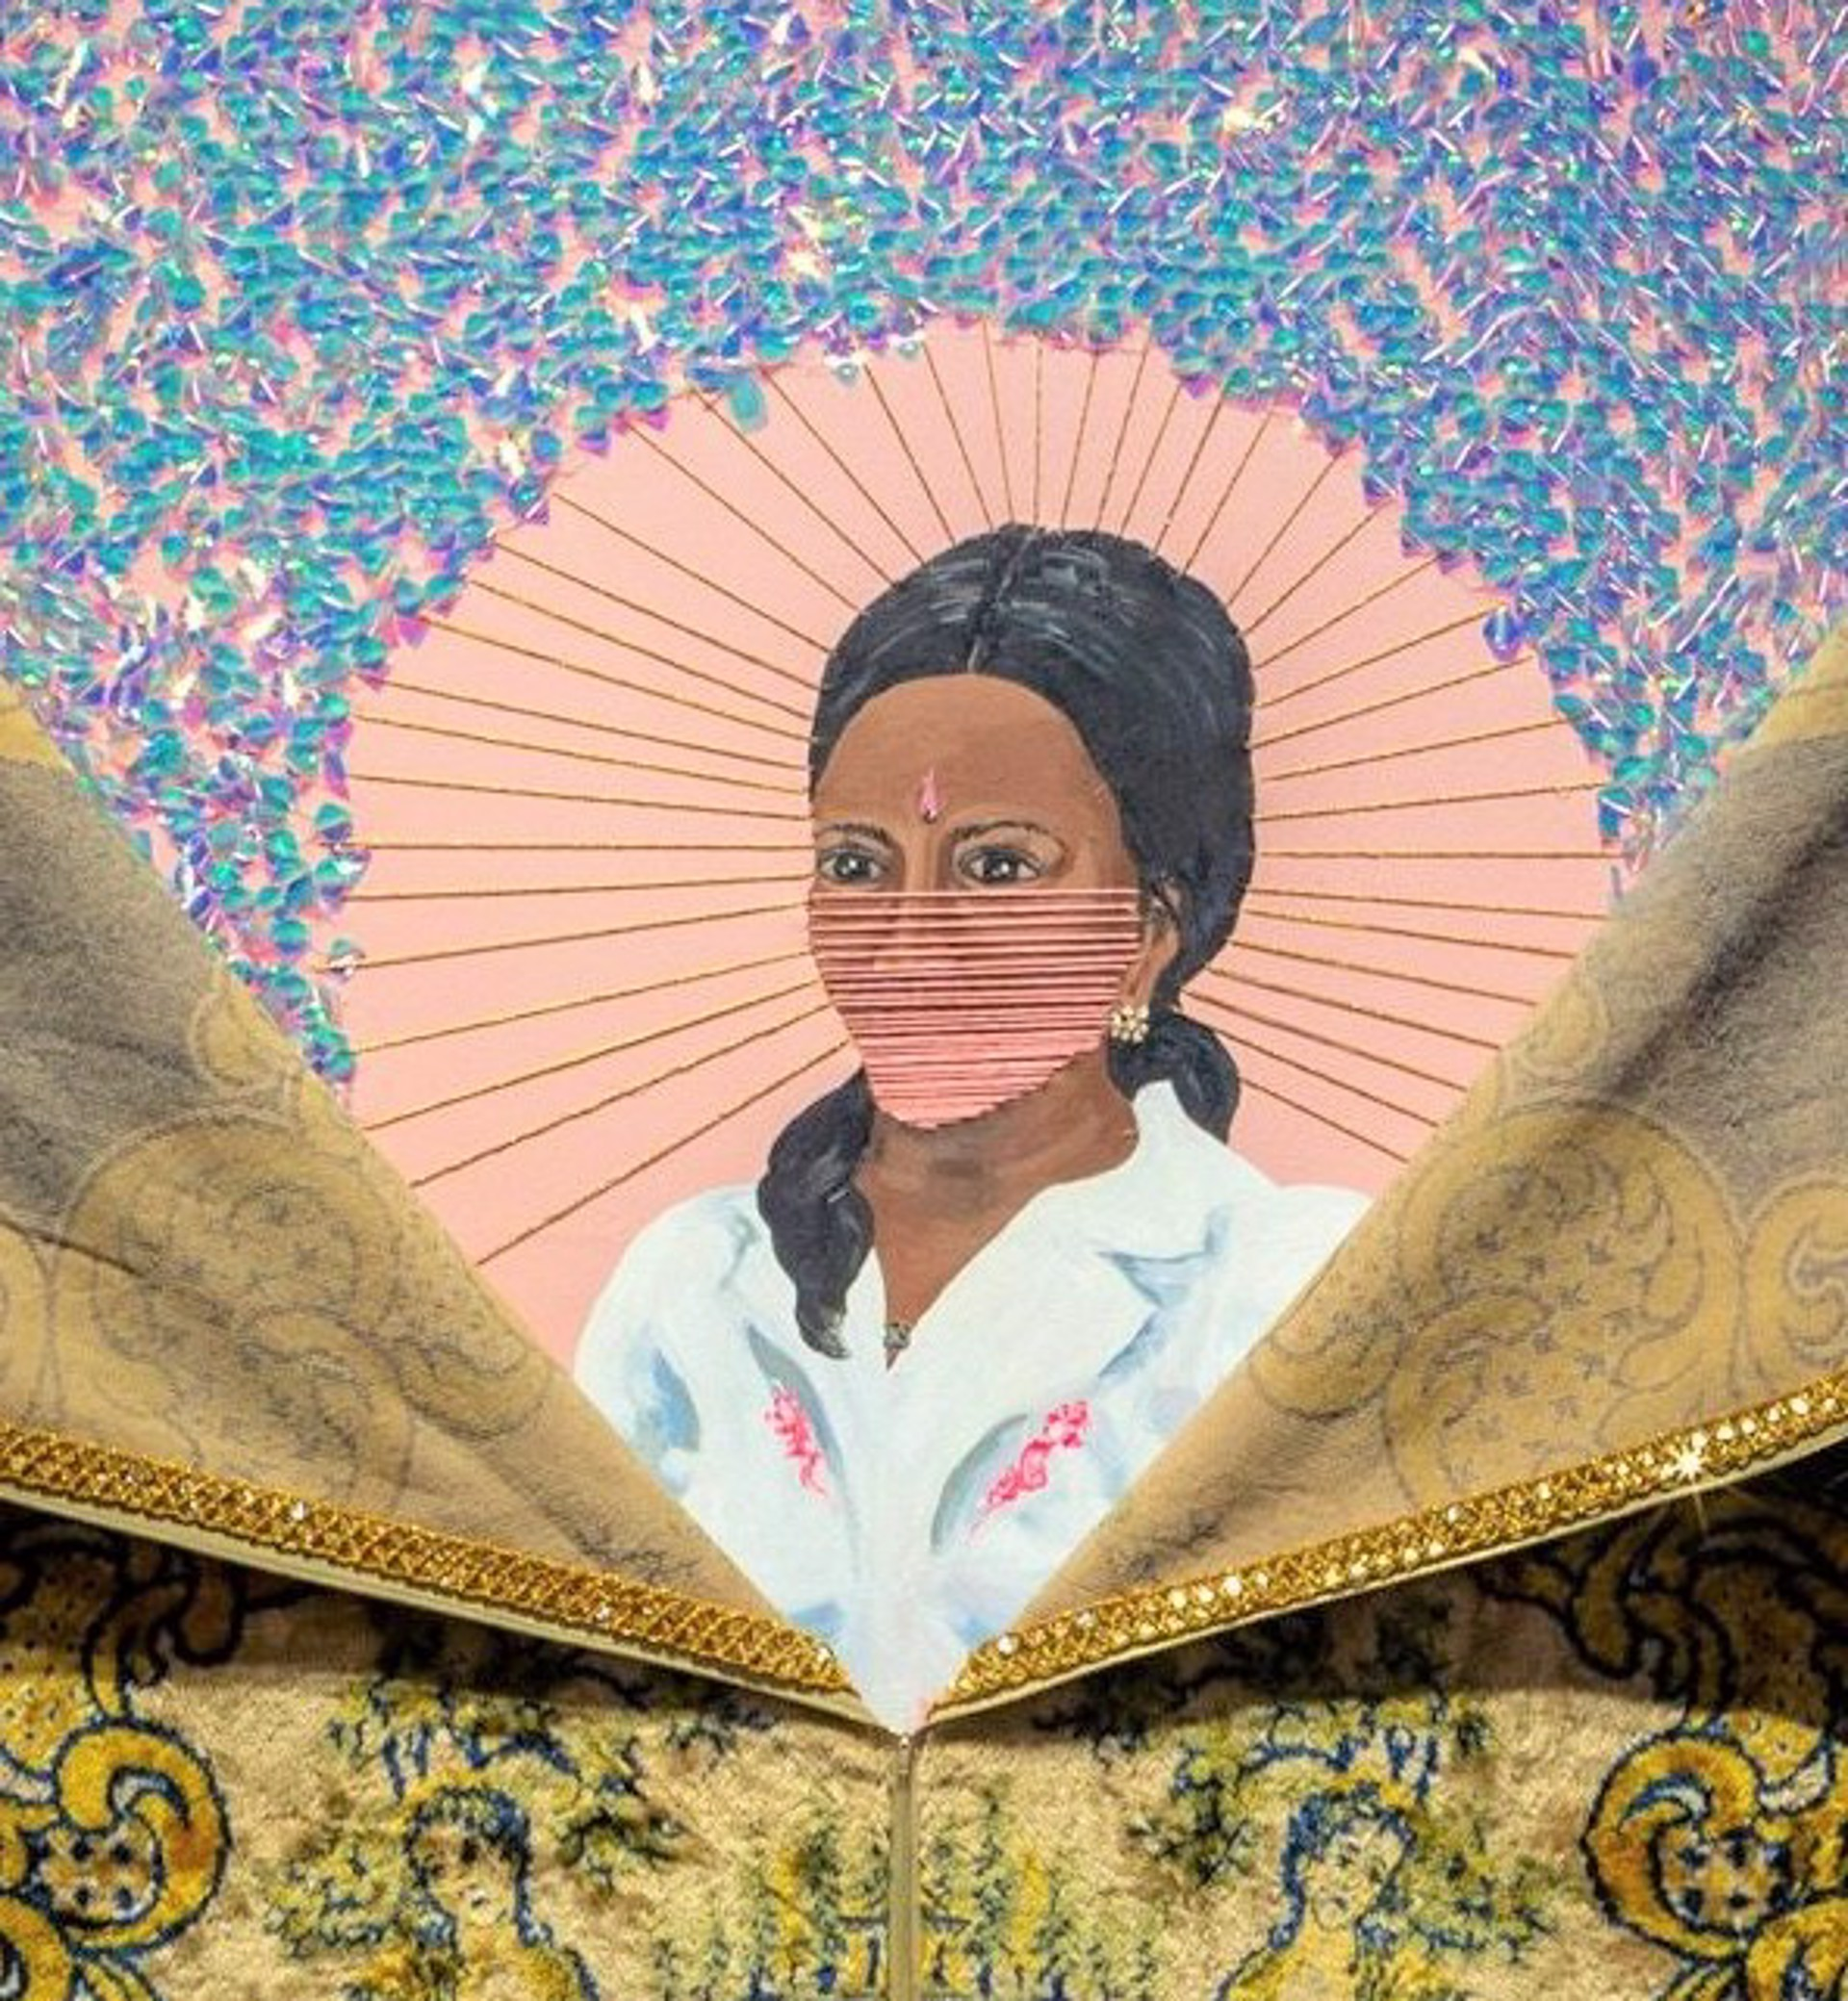 Calypso Queen by Suchitra Mattai